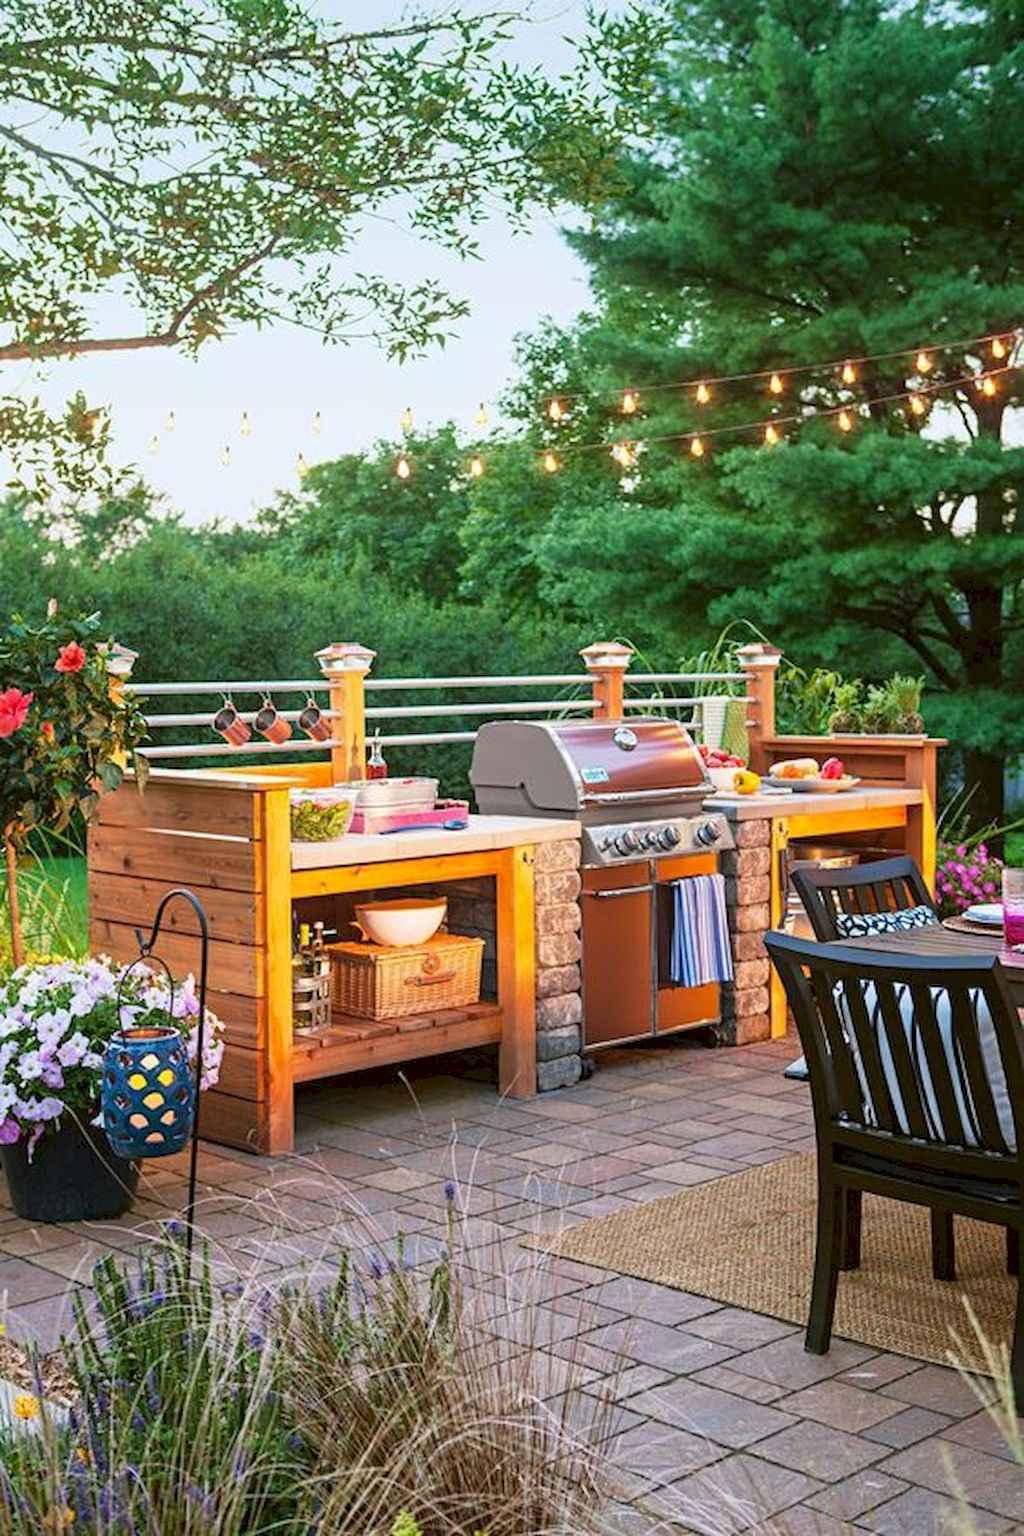 astonishing outdoor kitchen ideas | 60 Amazing DIY Outdoor Kitchen Ideas On A Budget ...